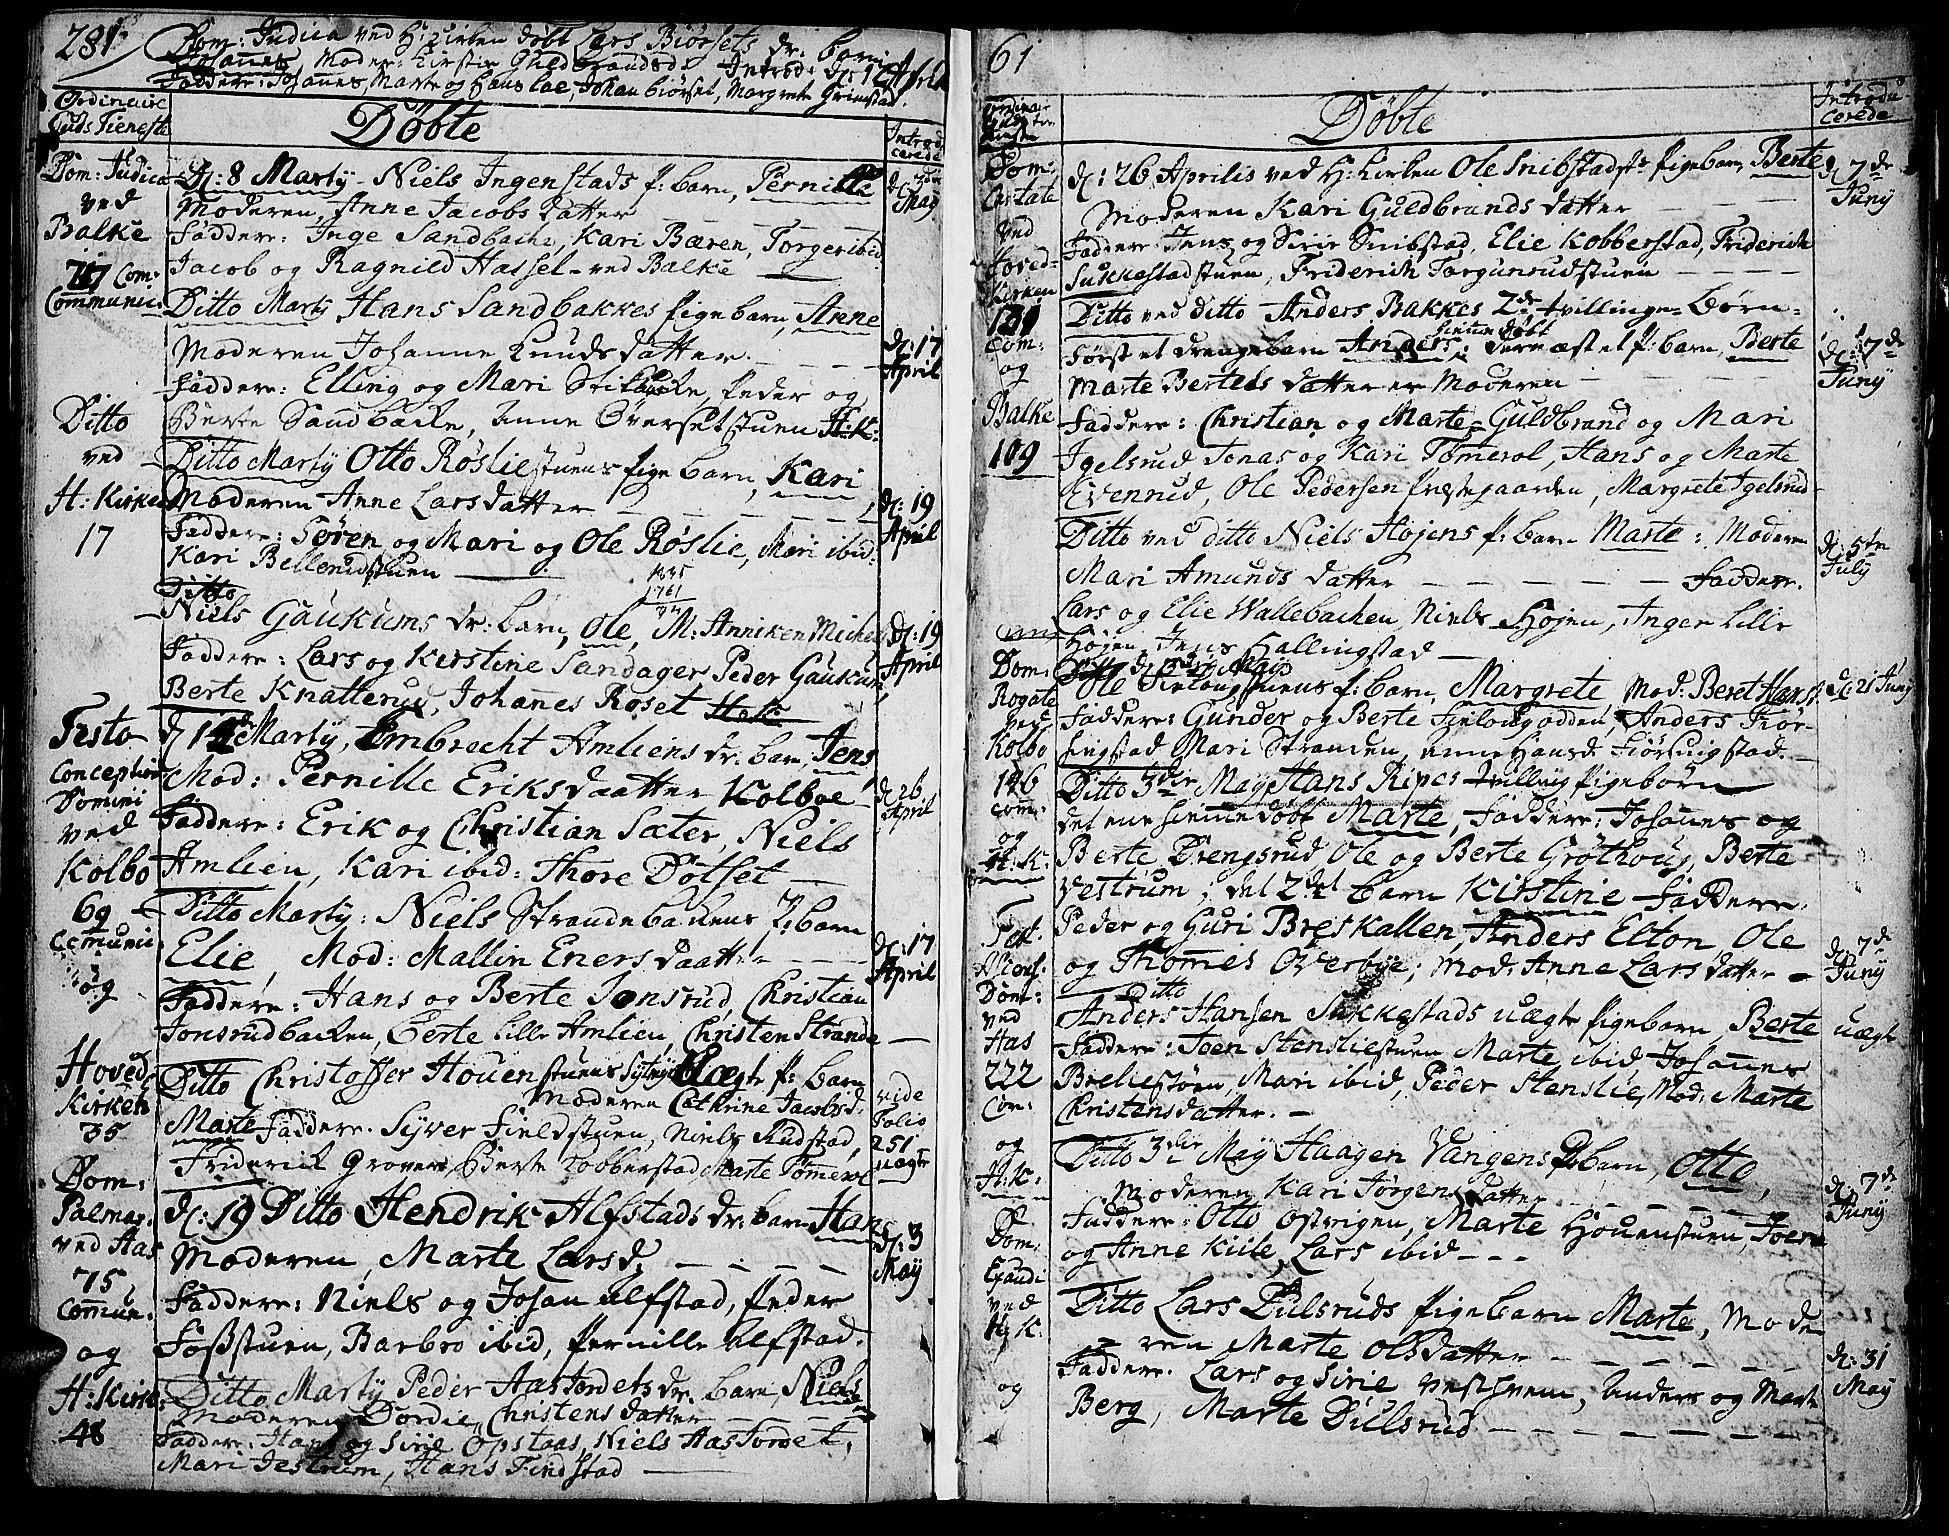 SAH, Toten prestekontor, Ministerialbok nr. 4, 1751-1761, s. 281